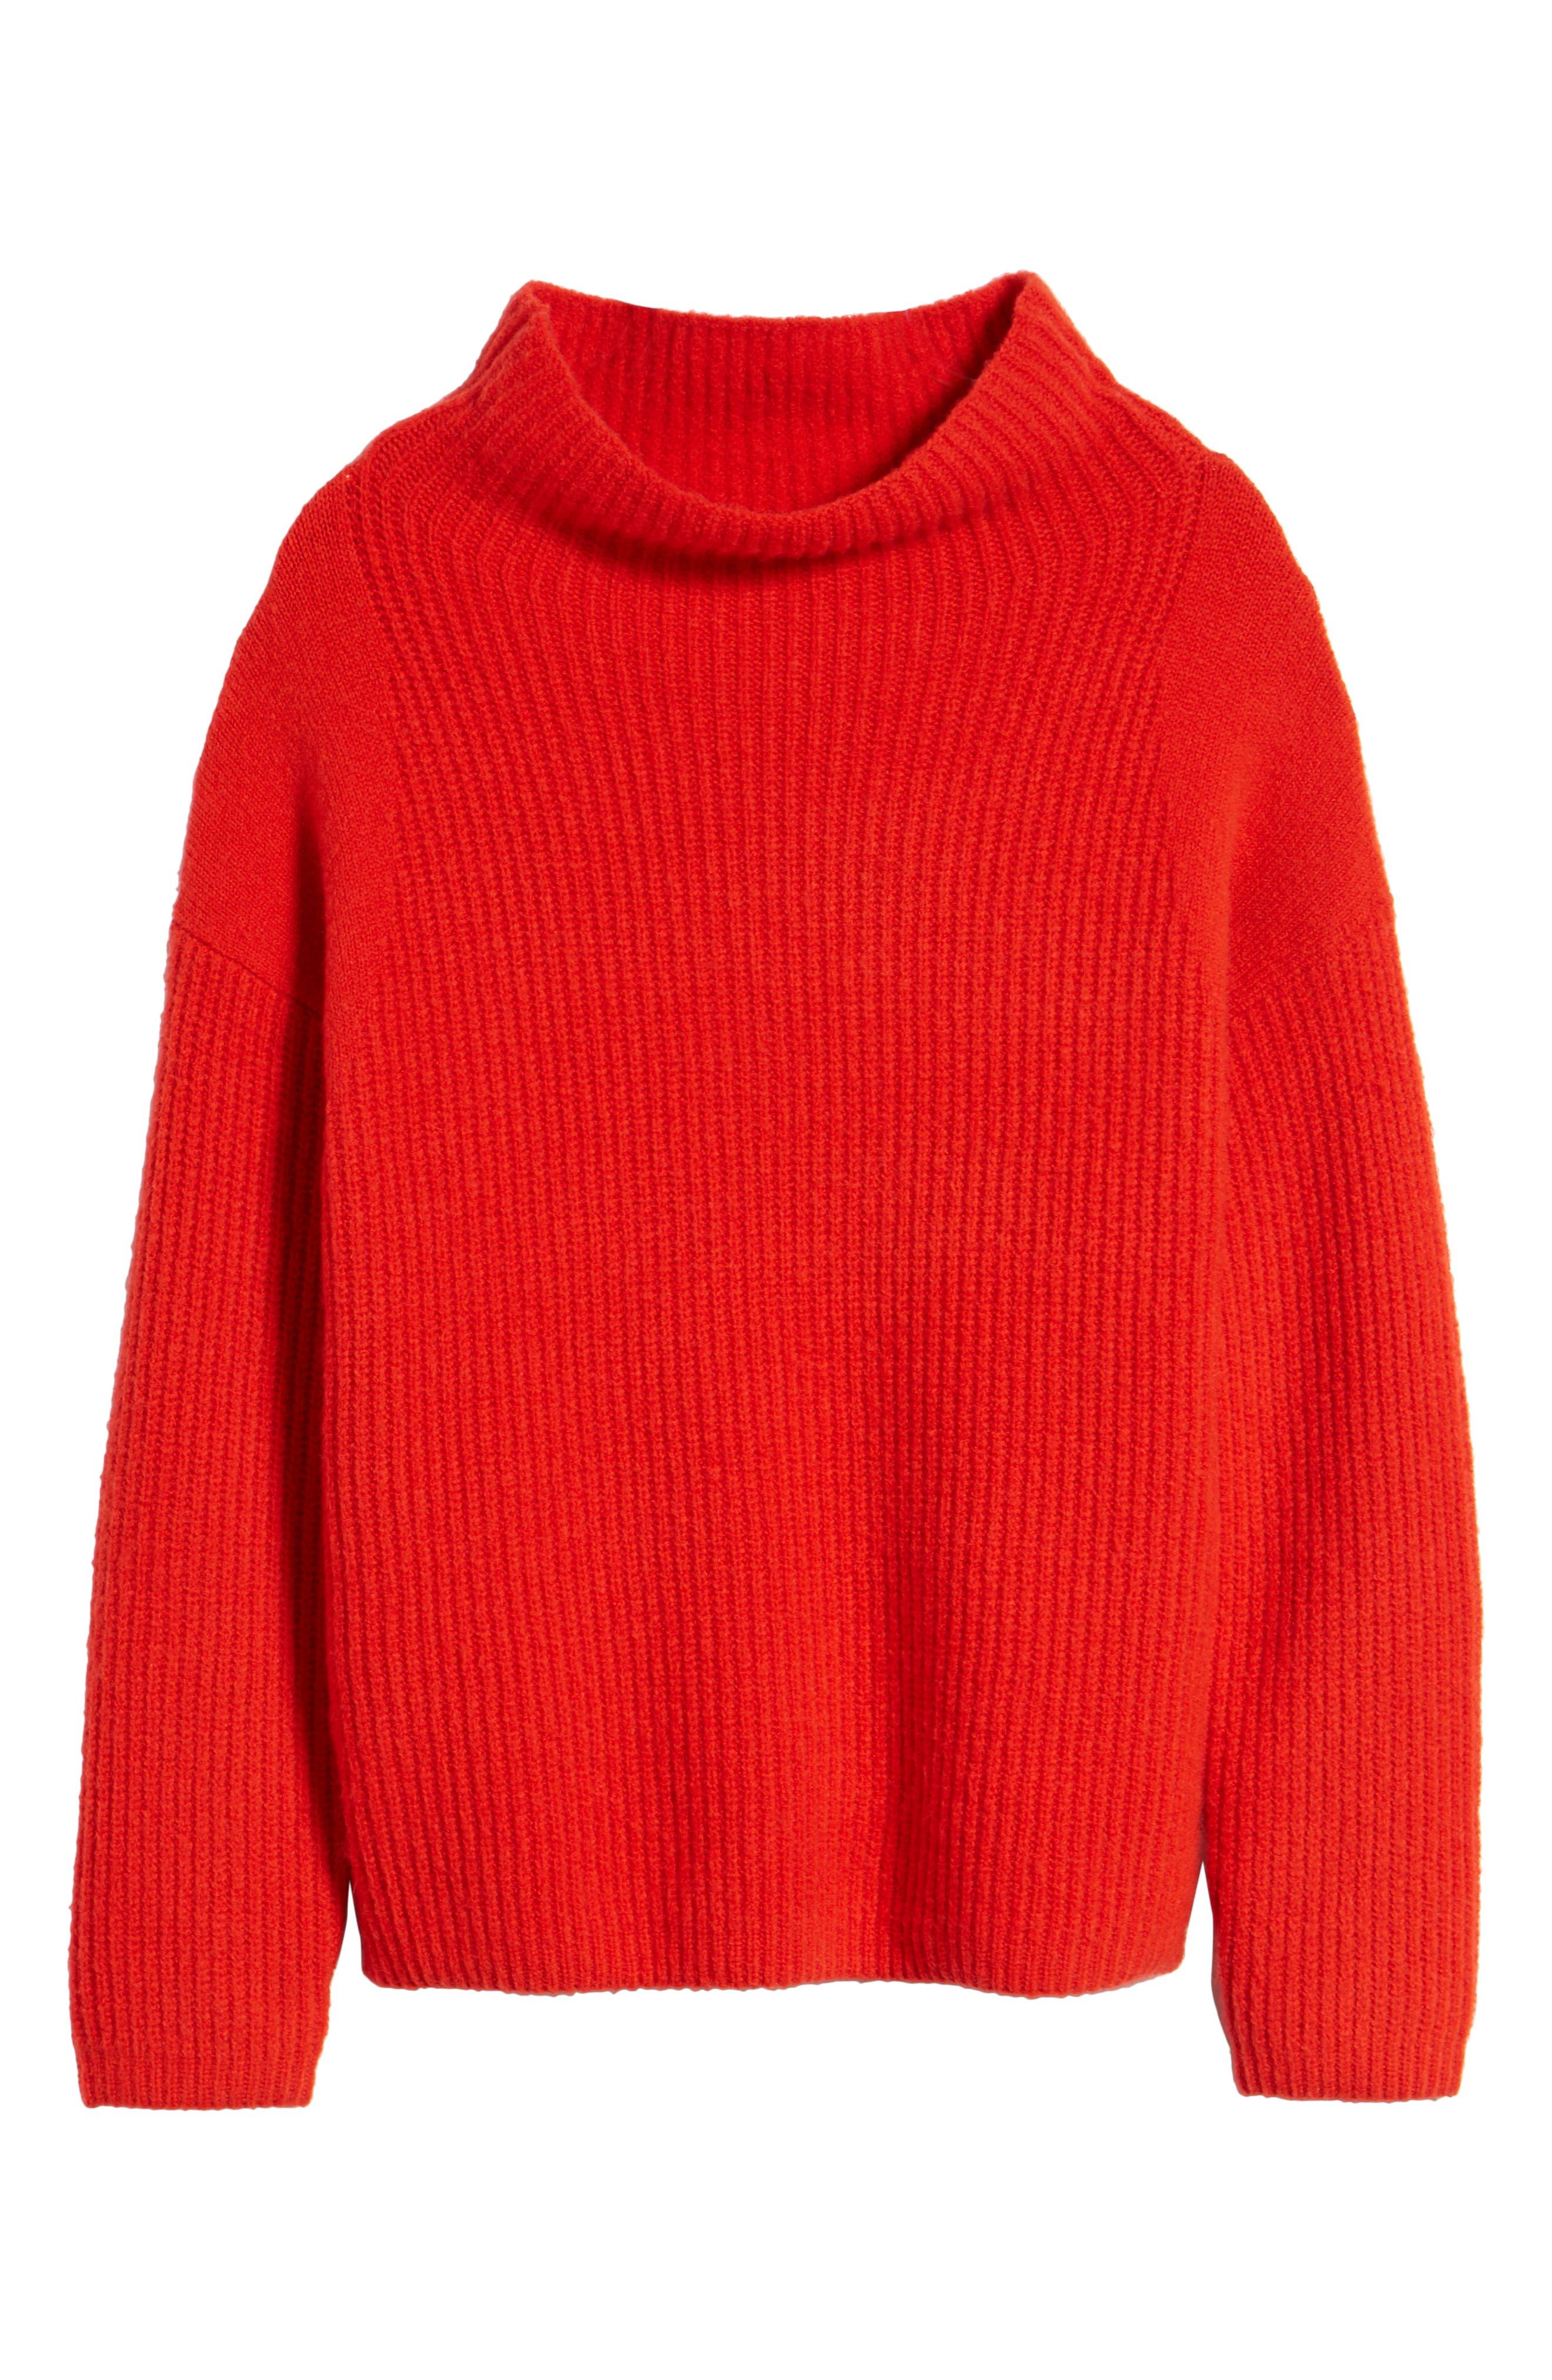 CHELSEA28, Rib Funnel Neck Sweater, Alternate thumbnail 7, color, 610